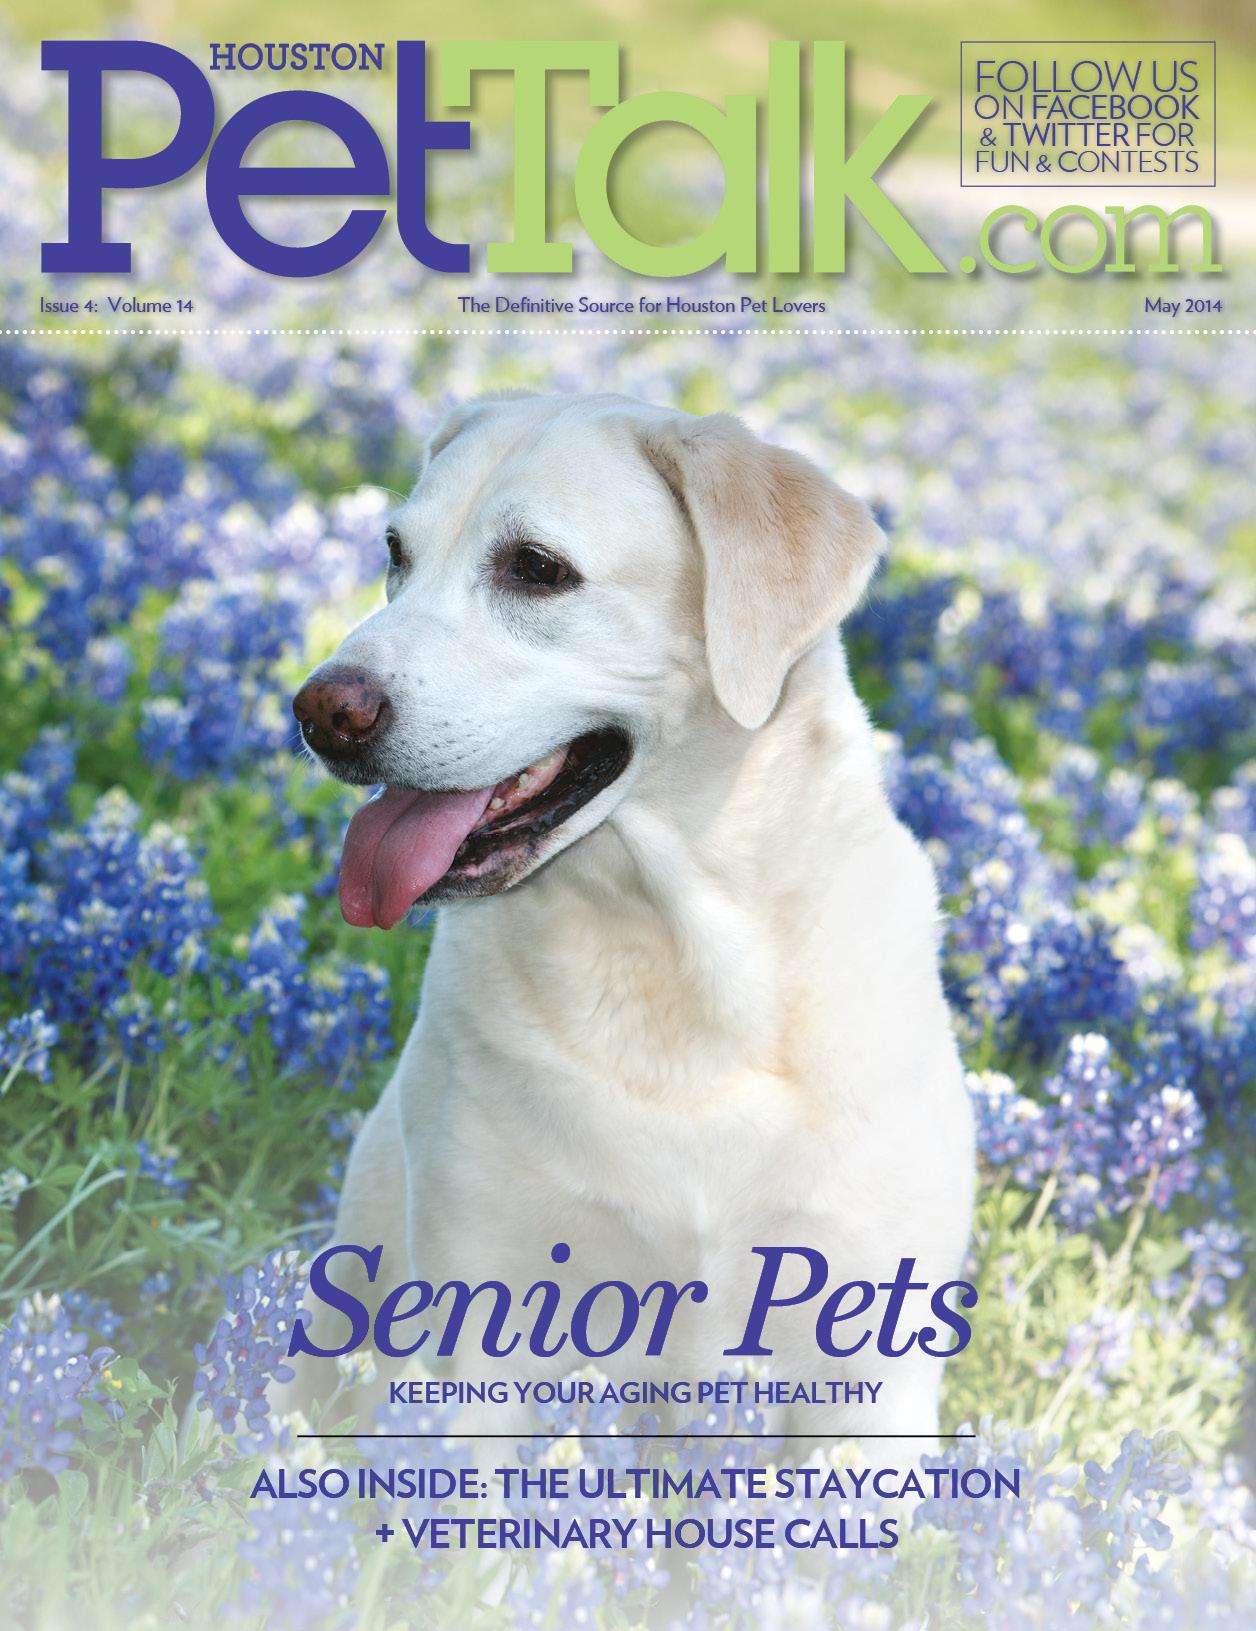 May 2014 Digital Issue of Houston PetTalk